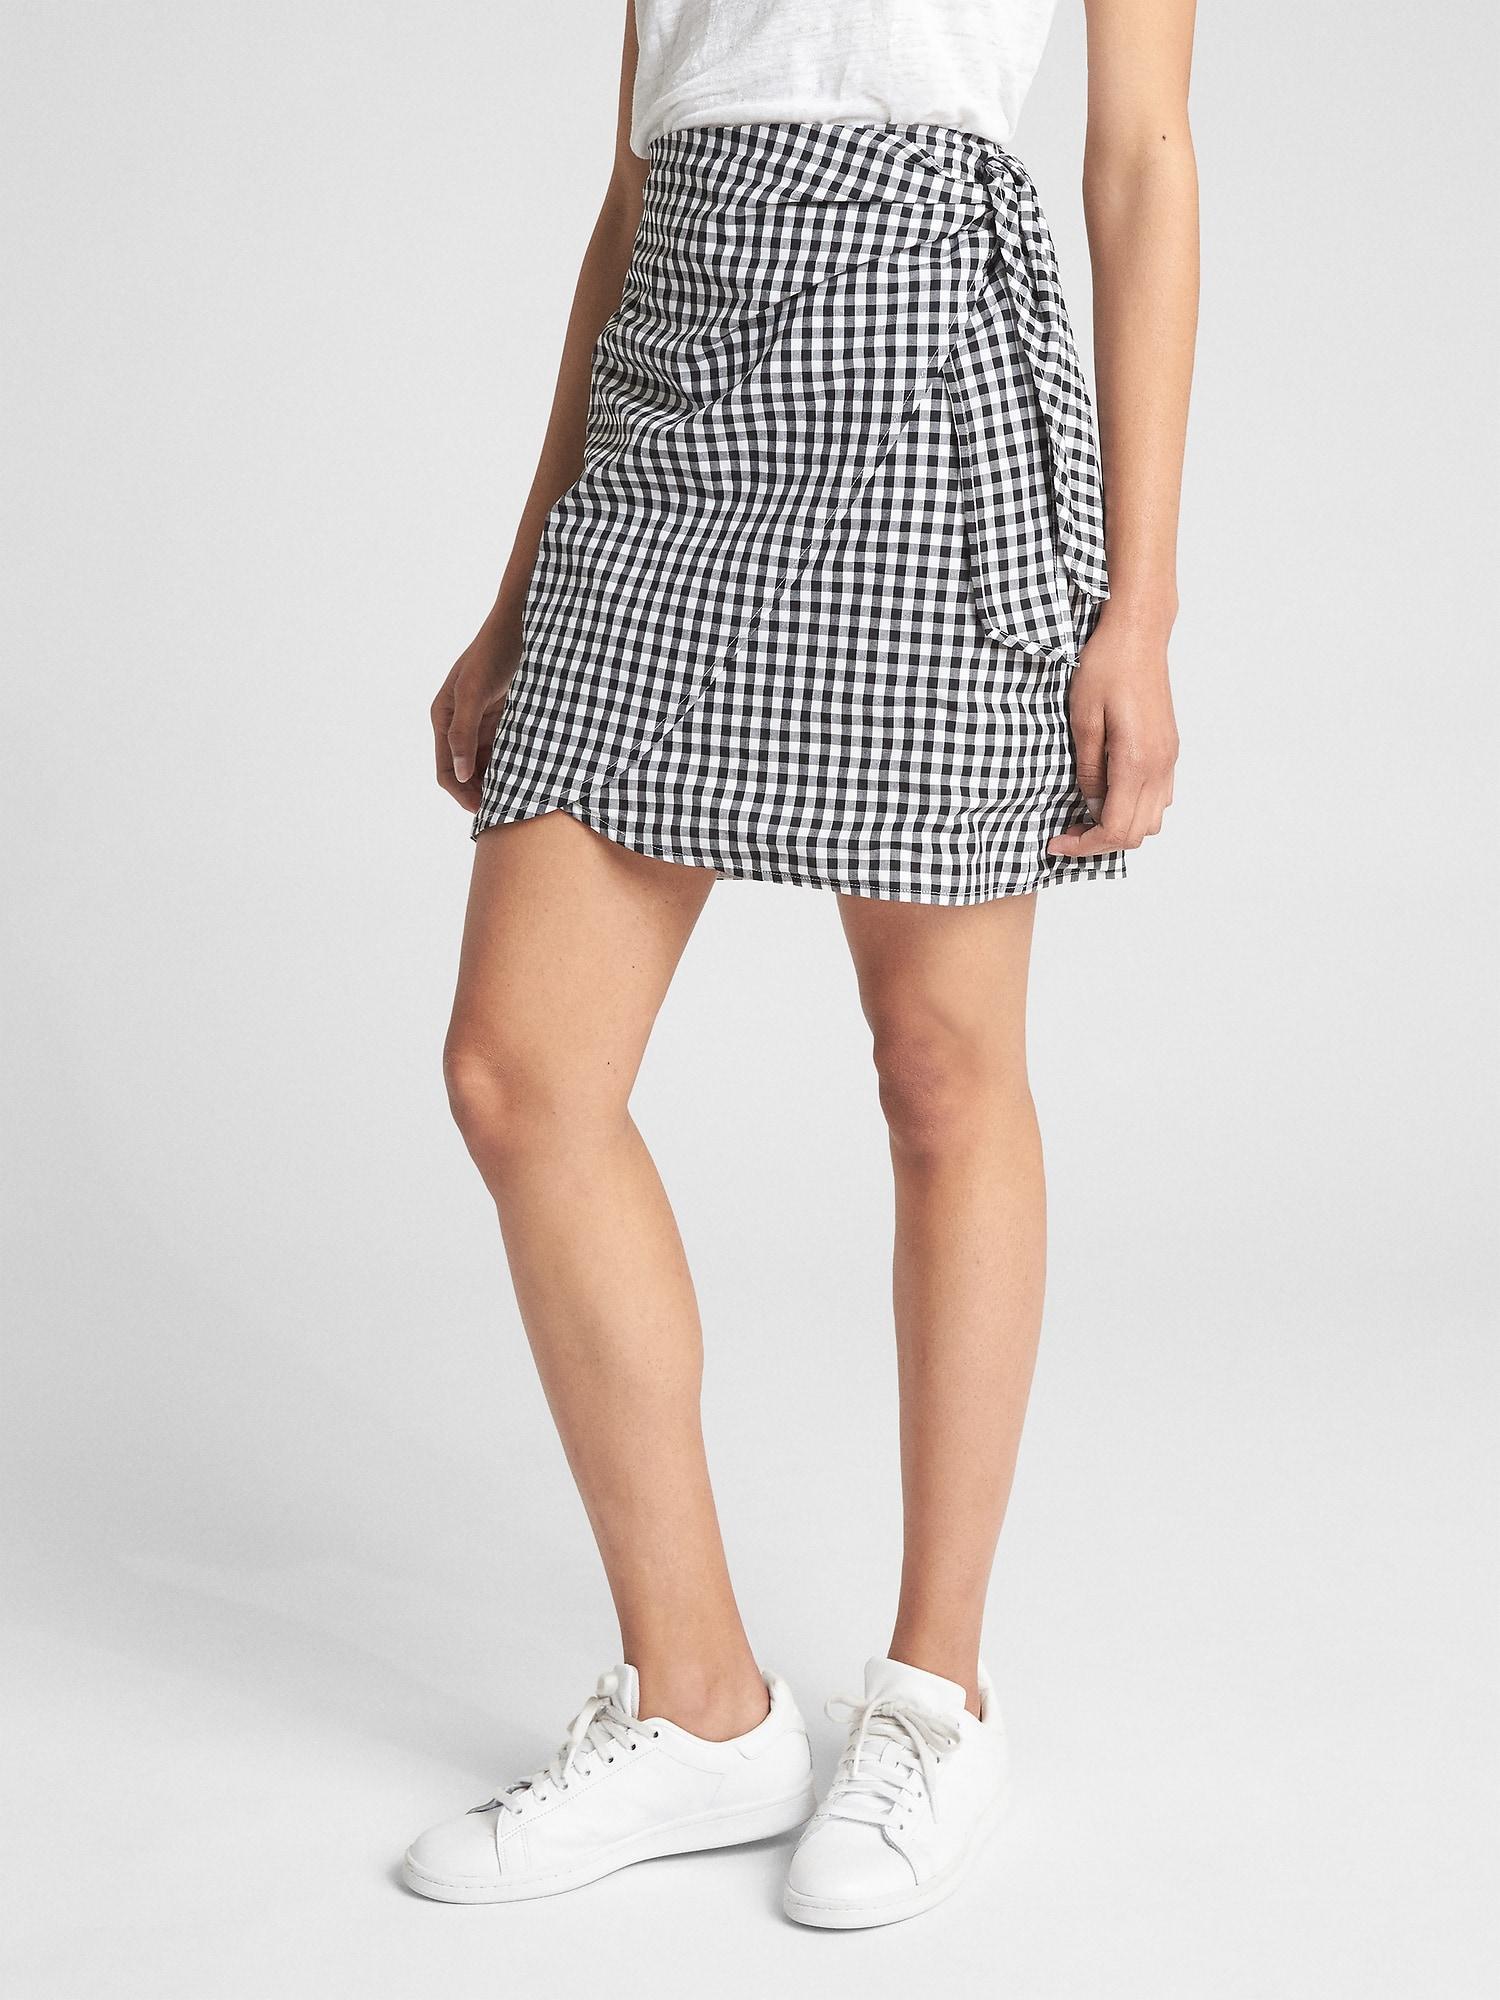 fa99abdd76 Lyst - Gap Gingham Print Wrap Mini Skirt in Black